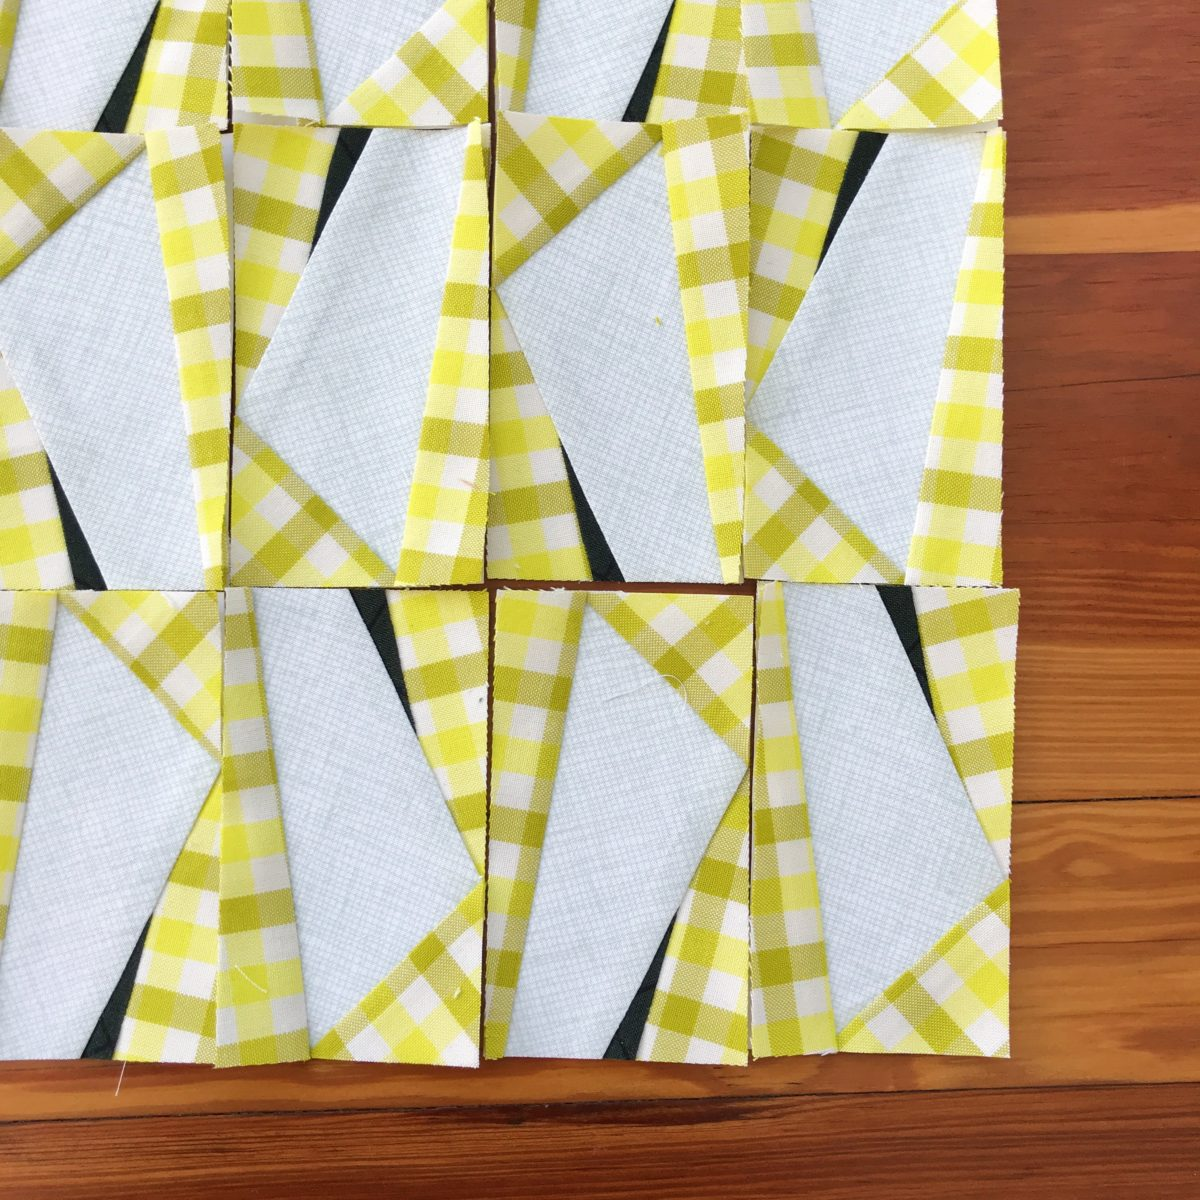 sewing lotts, lott quilt blocks